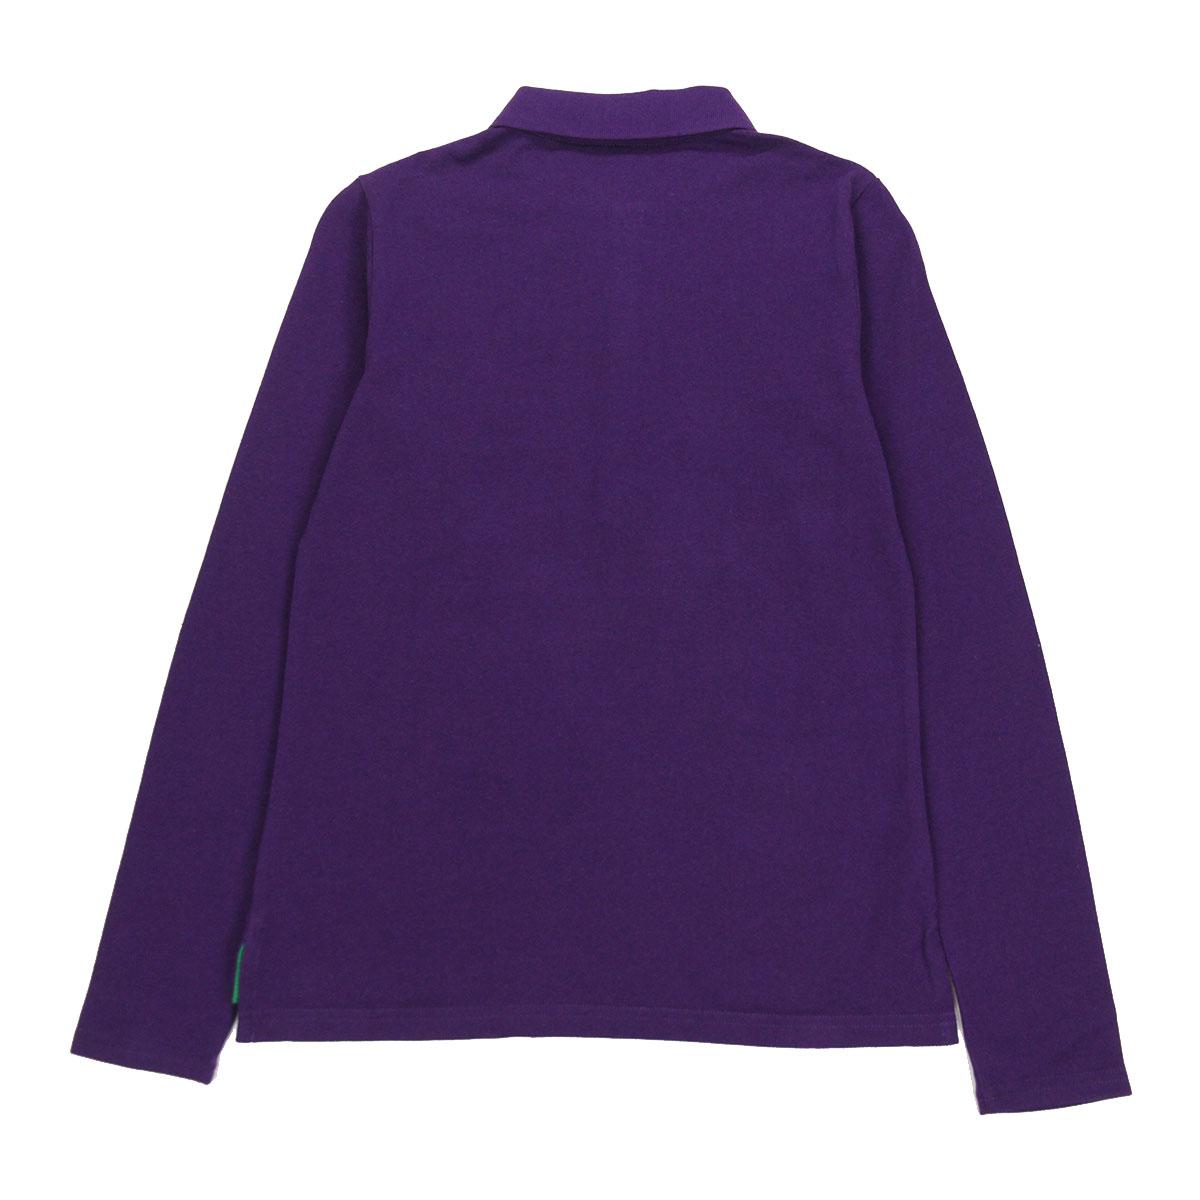 9d8cf0dcd Poloralflorenkids POLO RALPH LAUREN CHILDREN genuine kids clothing girls  Polo-Shirt Long-Sleeved Cotton Polo #24743826 PURPLE 40p22jul44